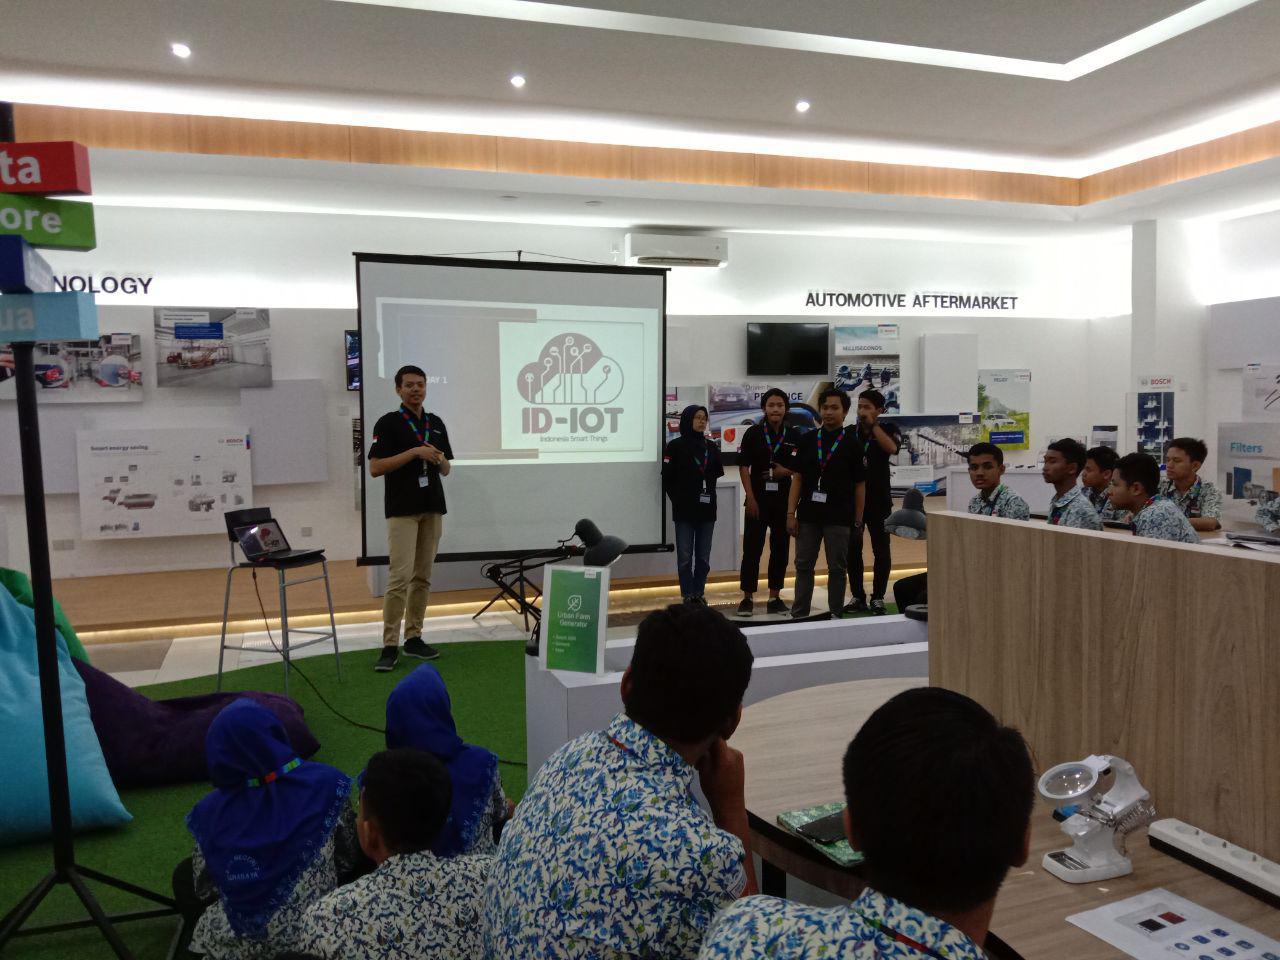 Pelatihan IoT Fundamental Tim ID-IoT dengan SMKN 7 Surabaya di Pt. Bosch Experiental and Innovation Center